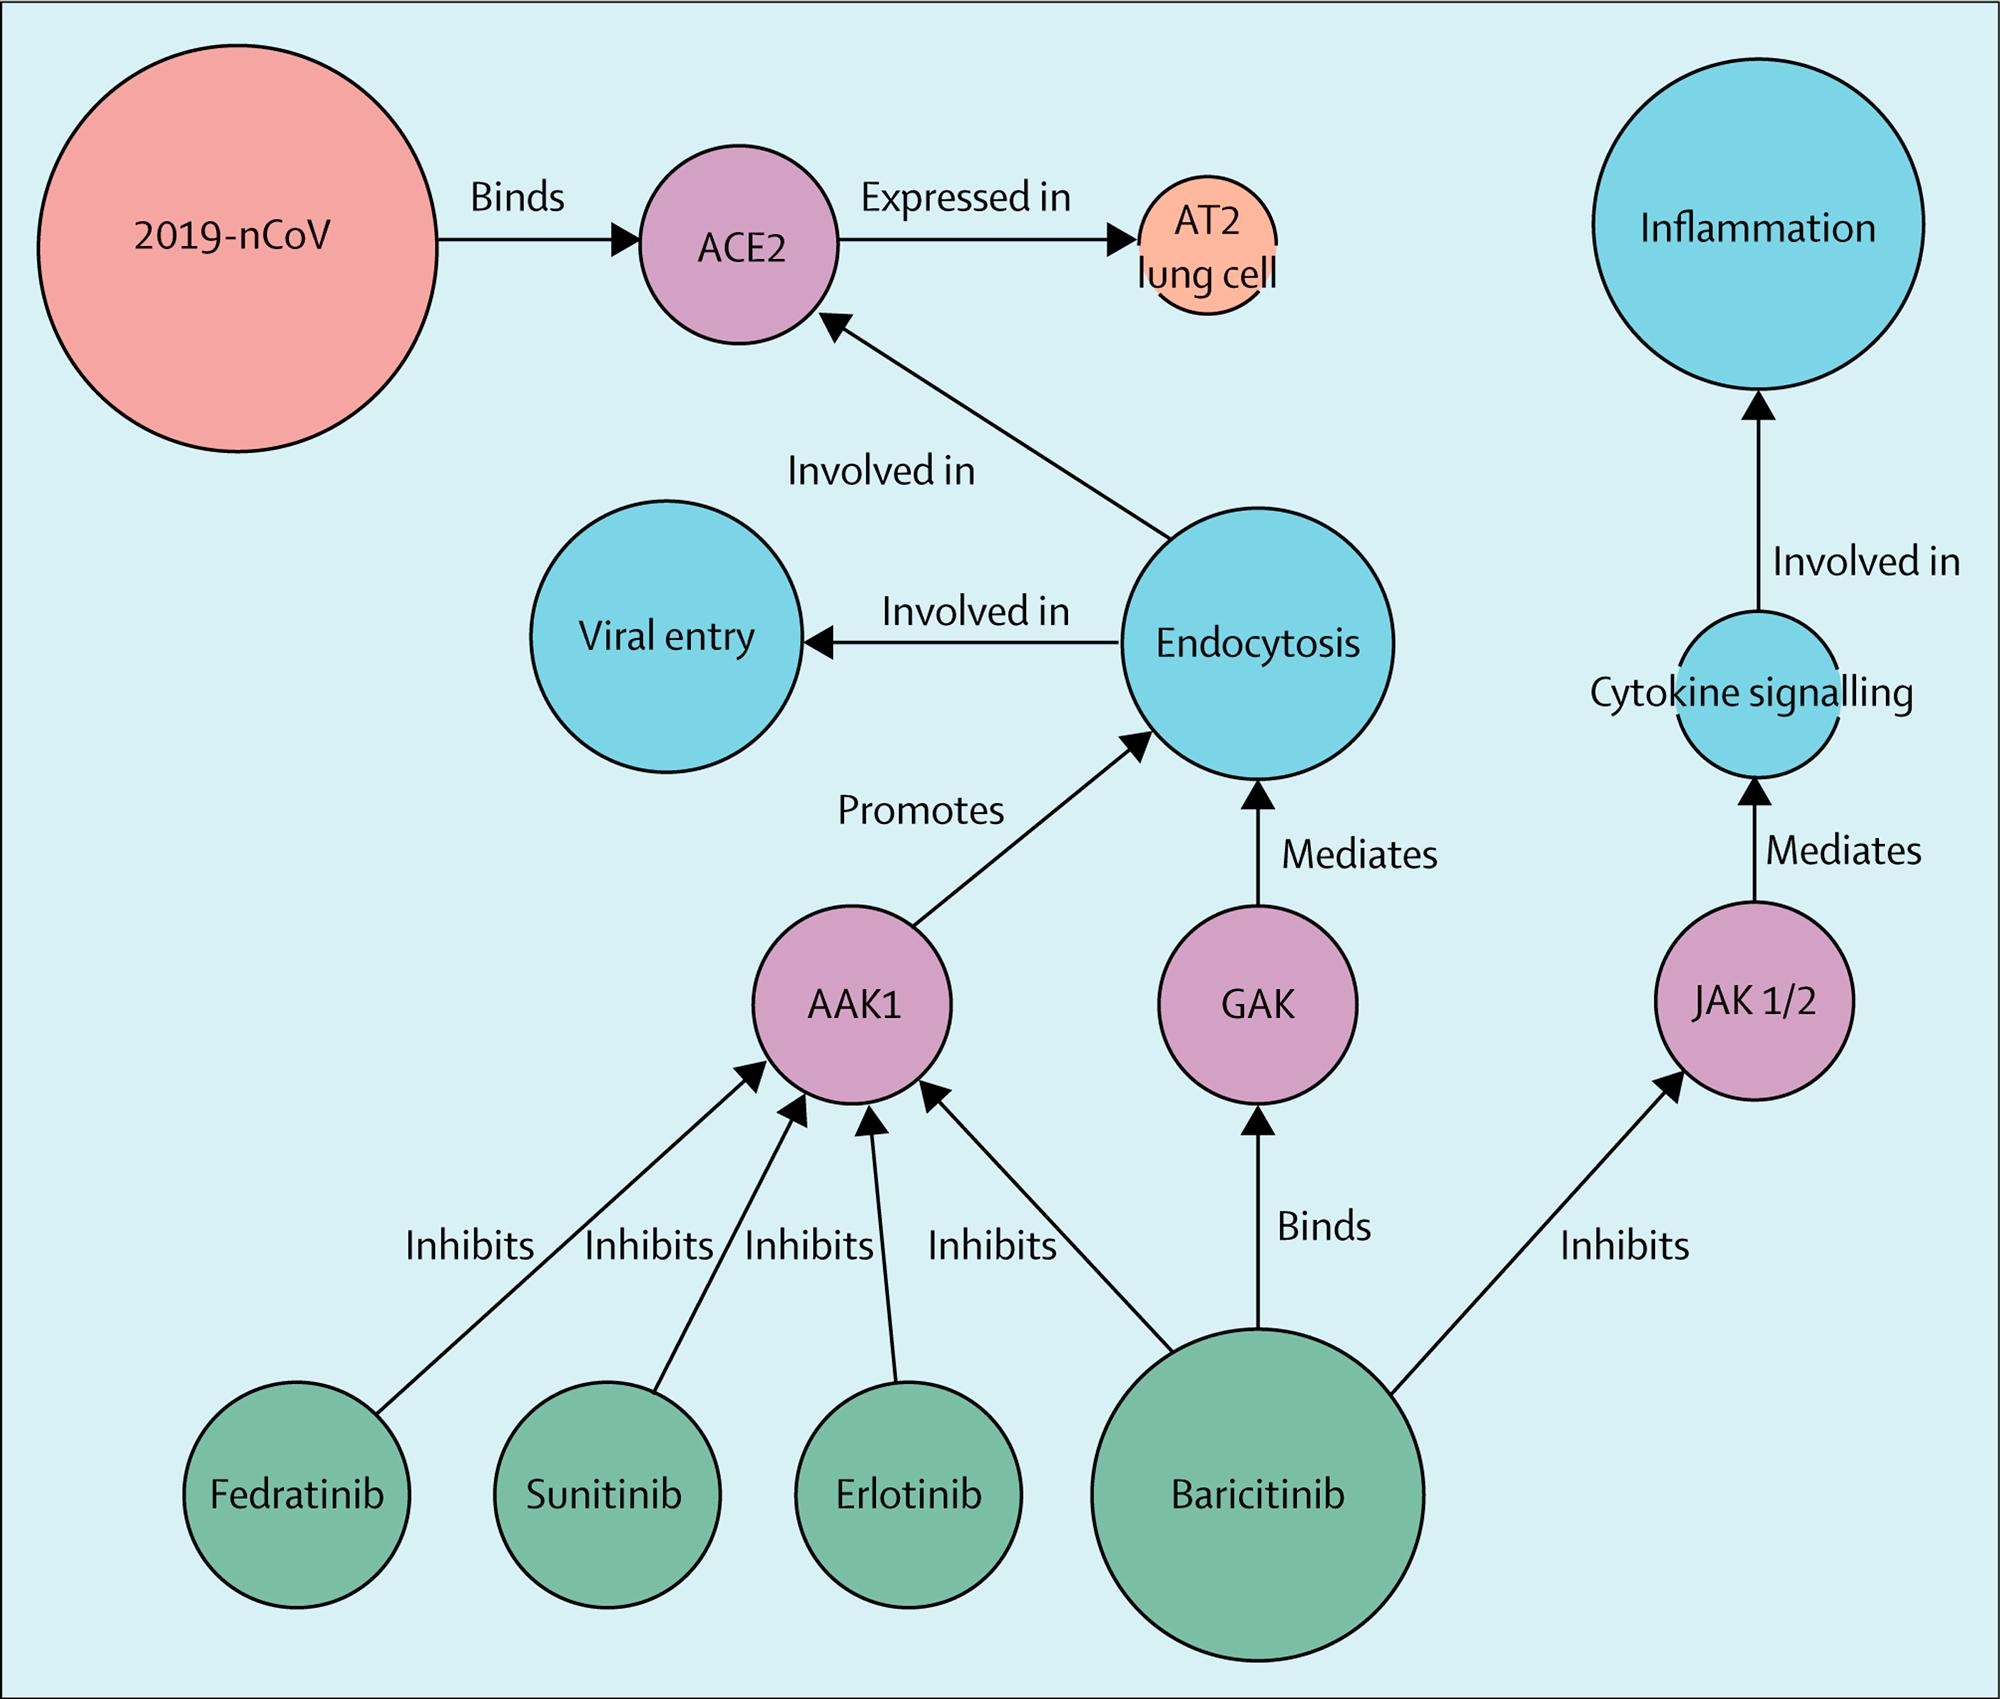 baricitinib covid 19 moa1 - Коронавирус. Лекарства. Ремдесивир плюс барицитиниб — работающая комбинация против COVID-19